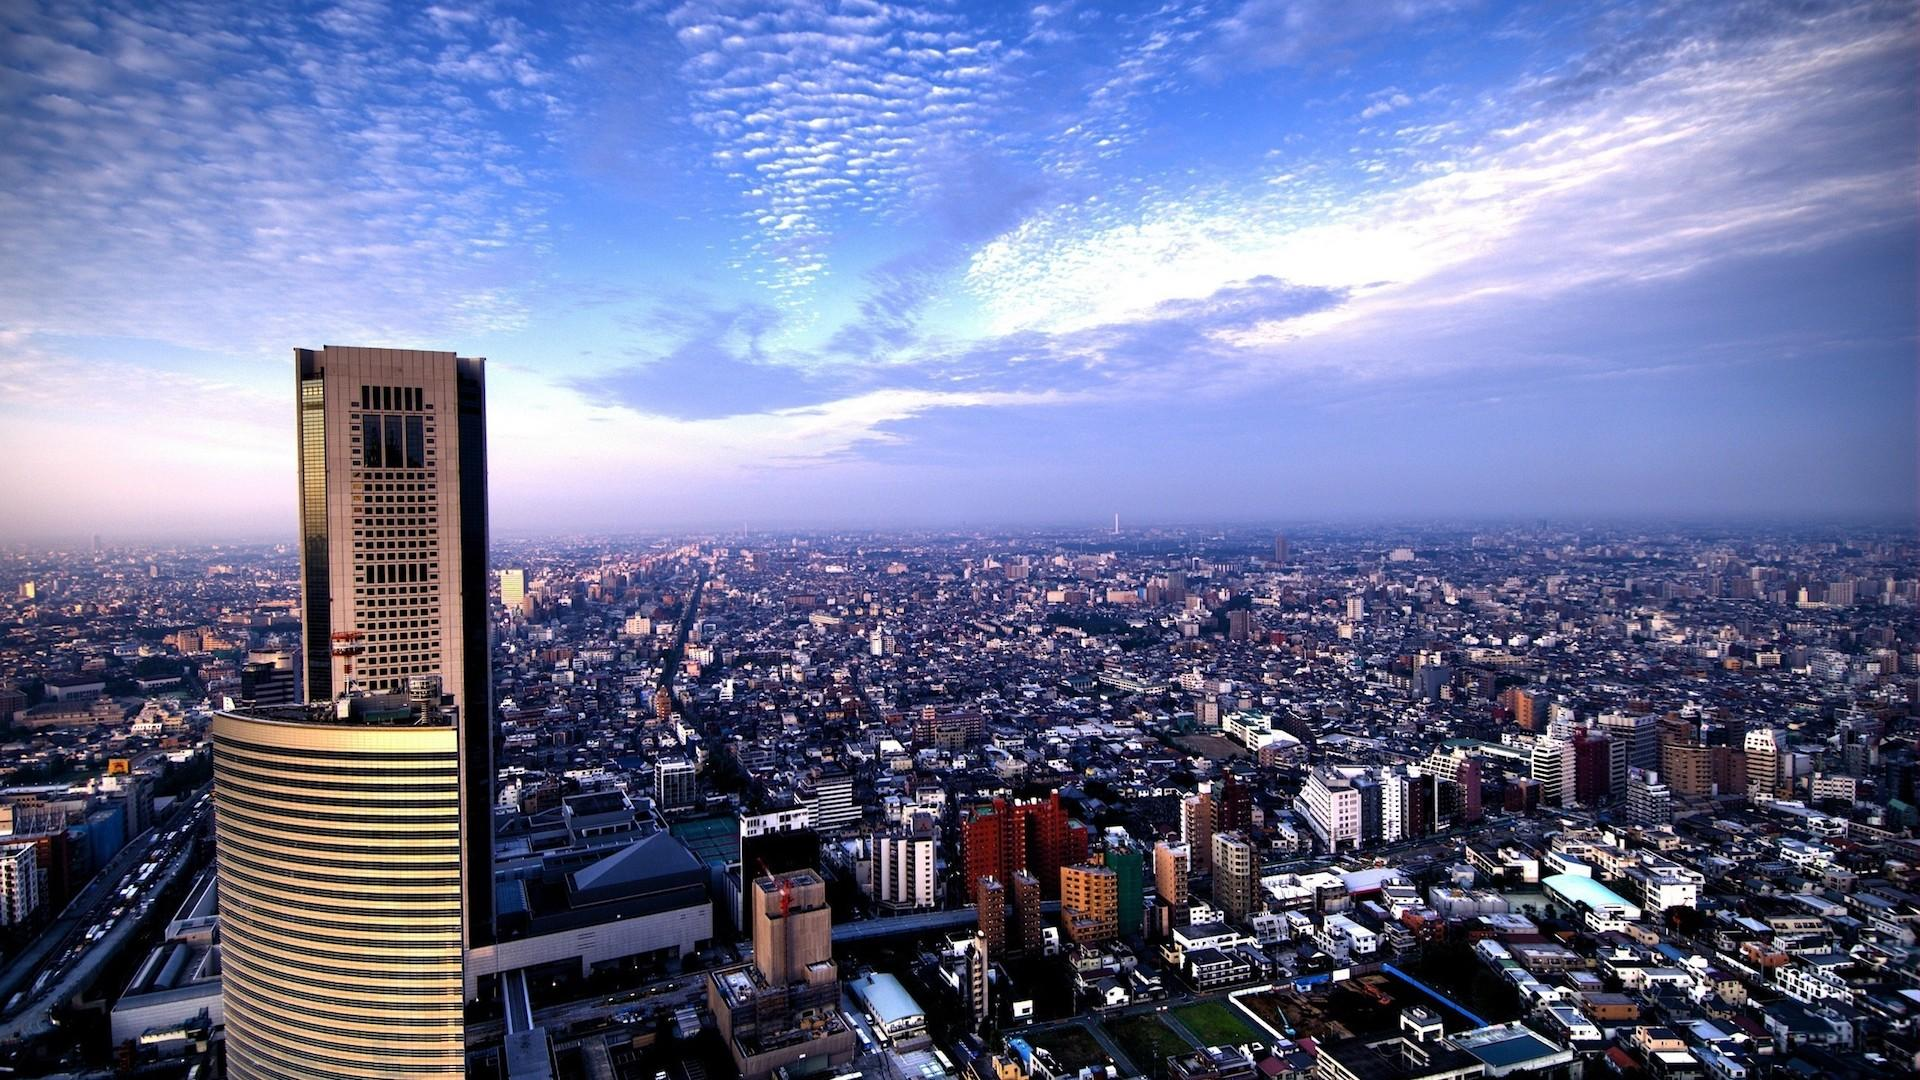 KLM con ofertas para volar a Asia: Seúl, Tokio, Shanghái y Bangkok